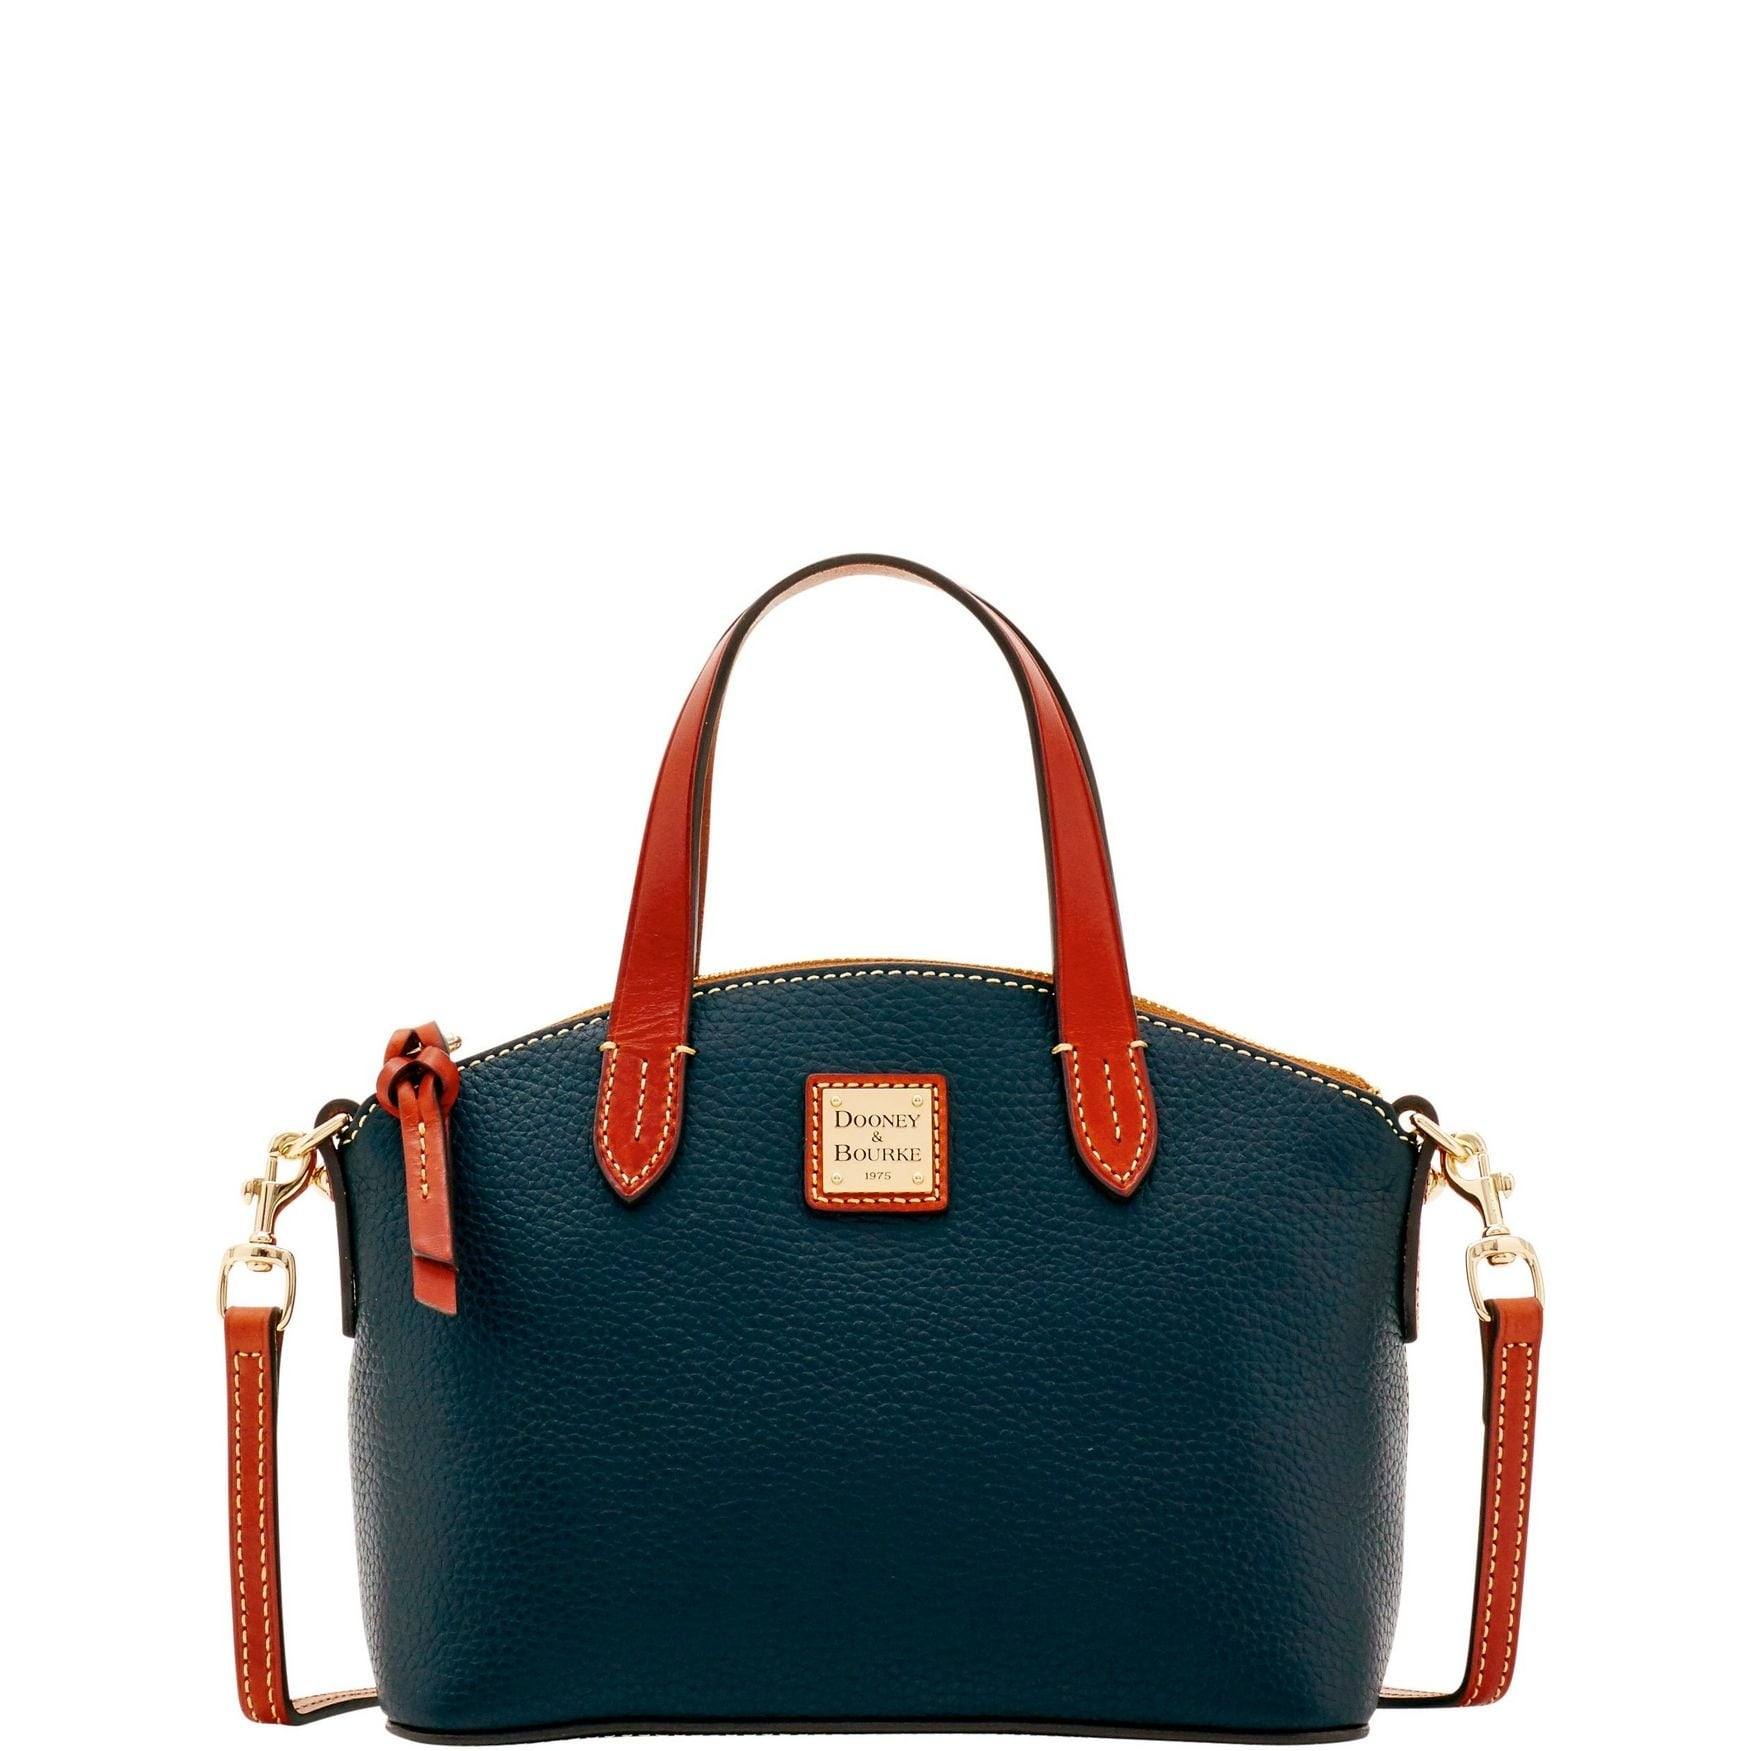 ebc422932 Designer Handbags | Find Great Designer Store Deals Shopping at Overstock